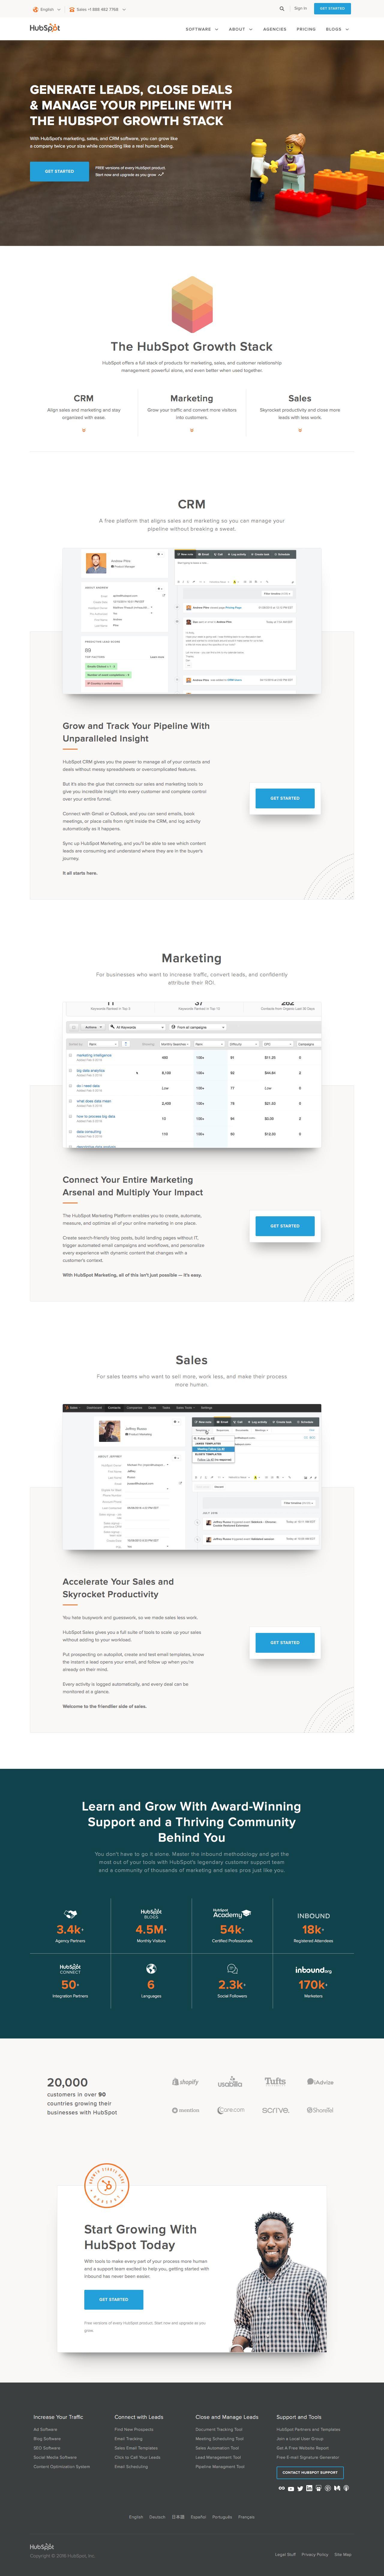 Screenshot of hubspot.com - HubSpot | Inbound Marketing & Sales Software - captured Nov. 10, 2016